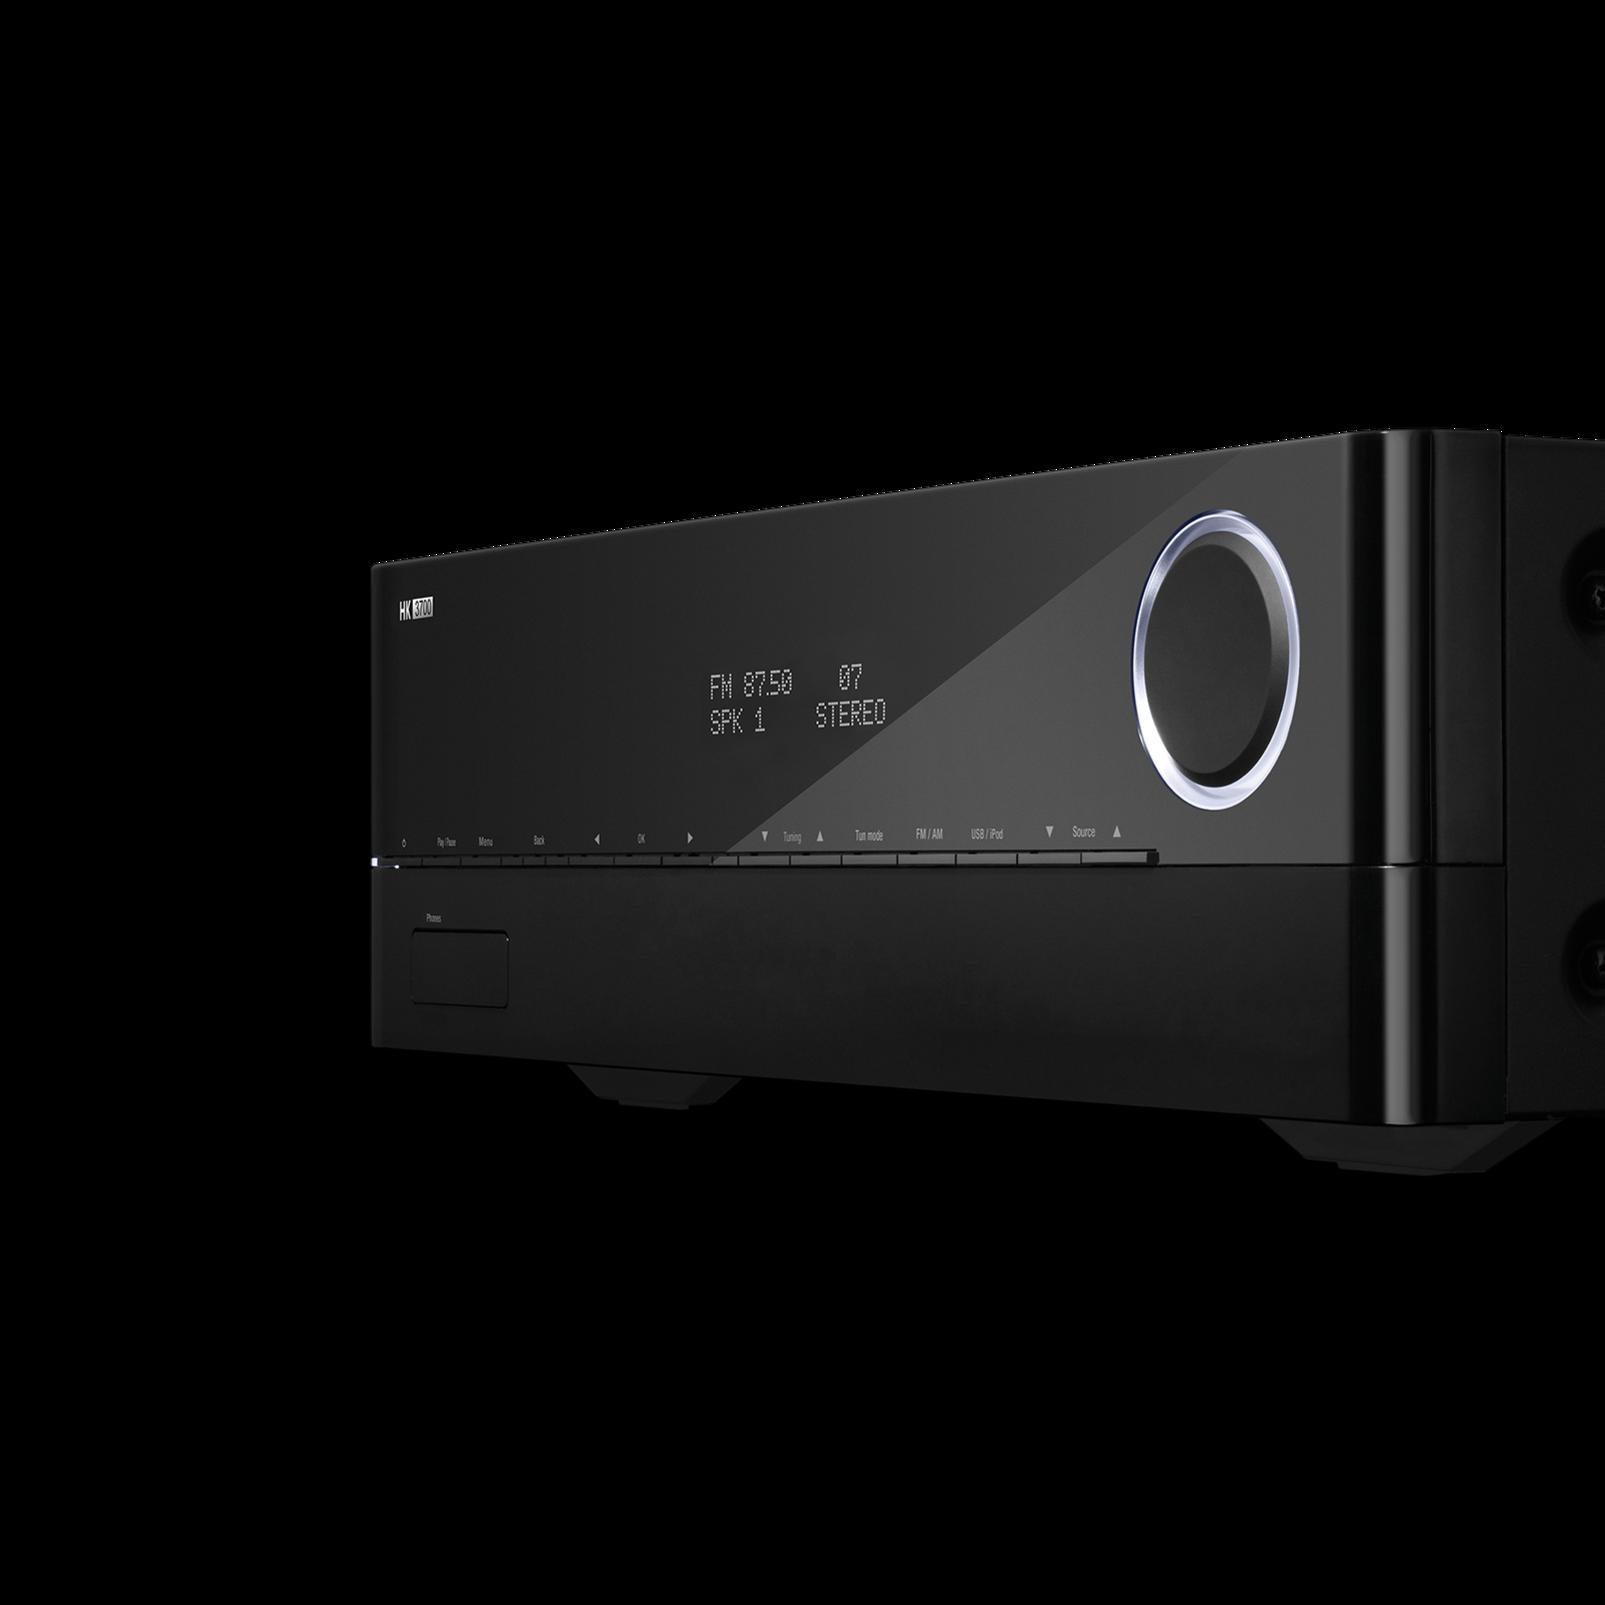 HK 3700 - Black - 170 watt stereo receiver with network connectivity - Detailshot 1